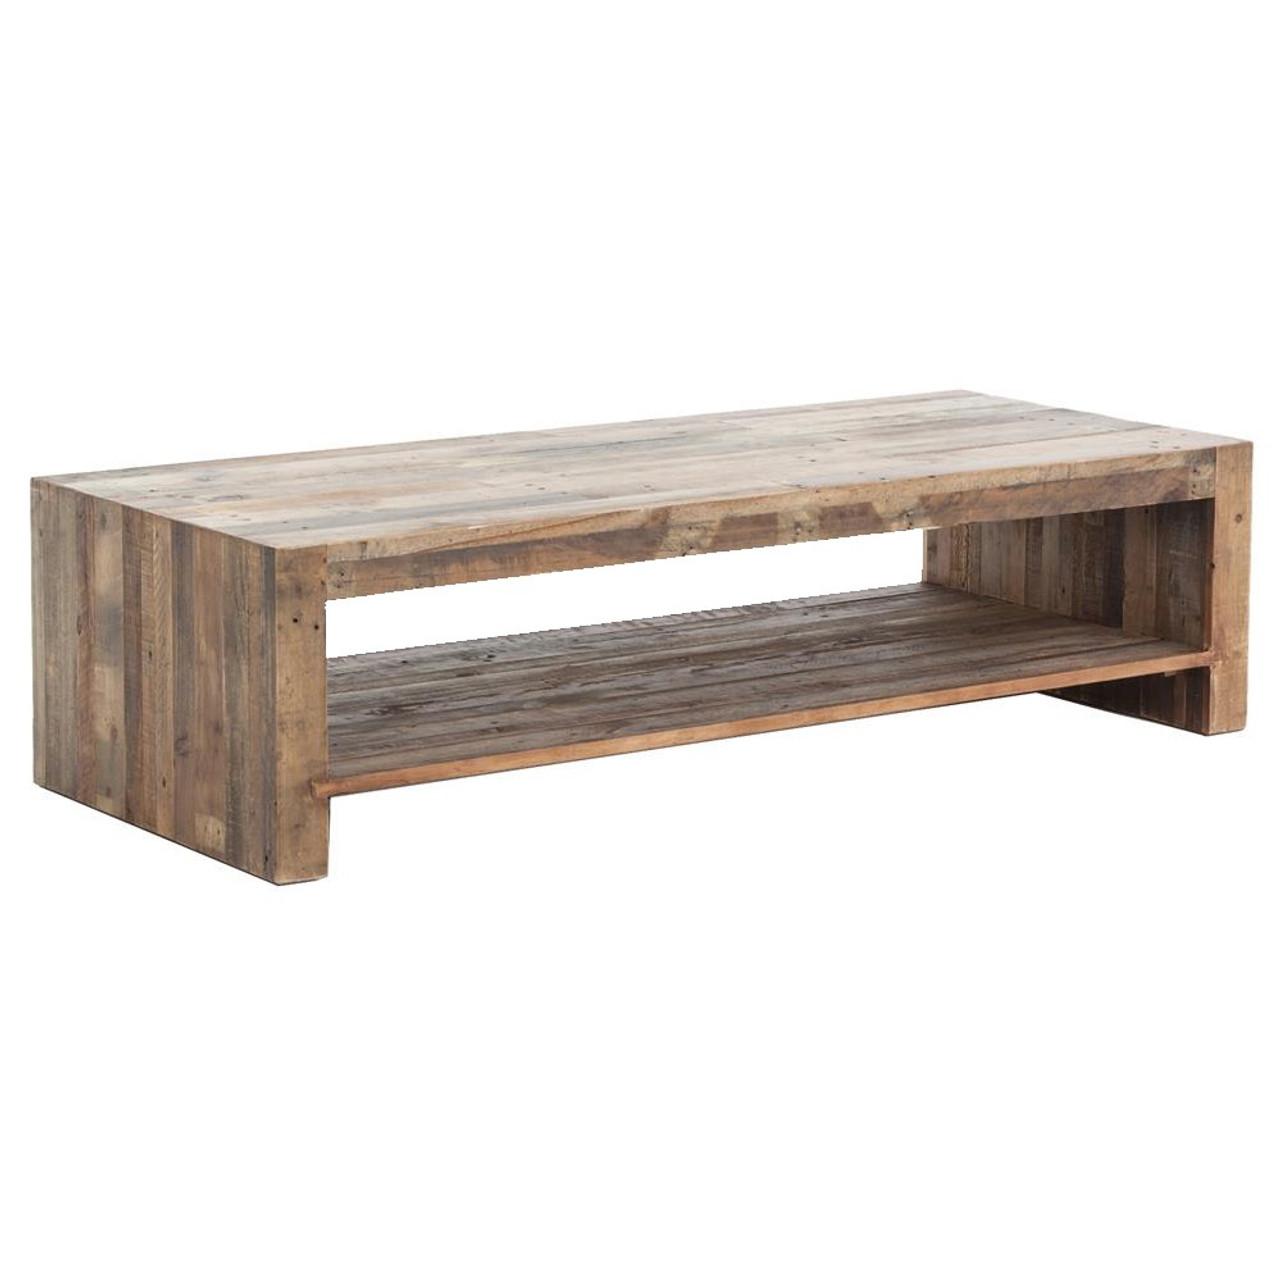 Angora Reclaimed Wood Coffee Table 48 Zin Home